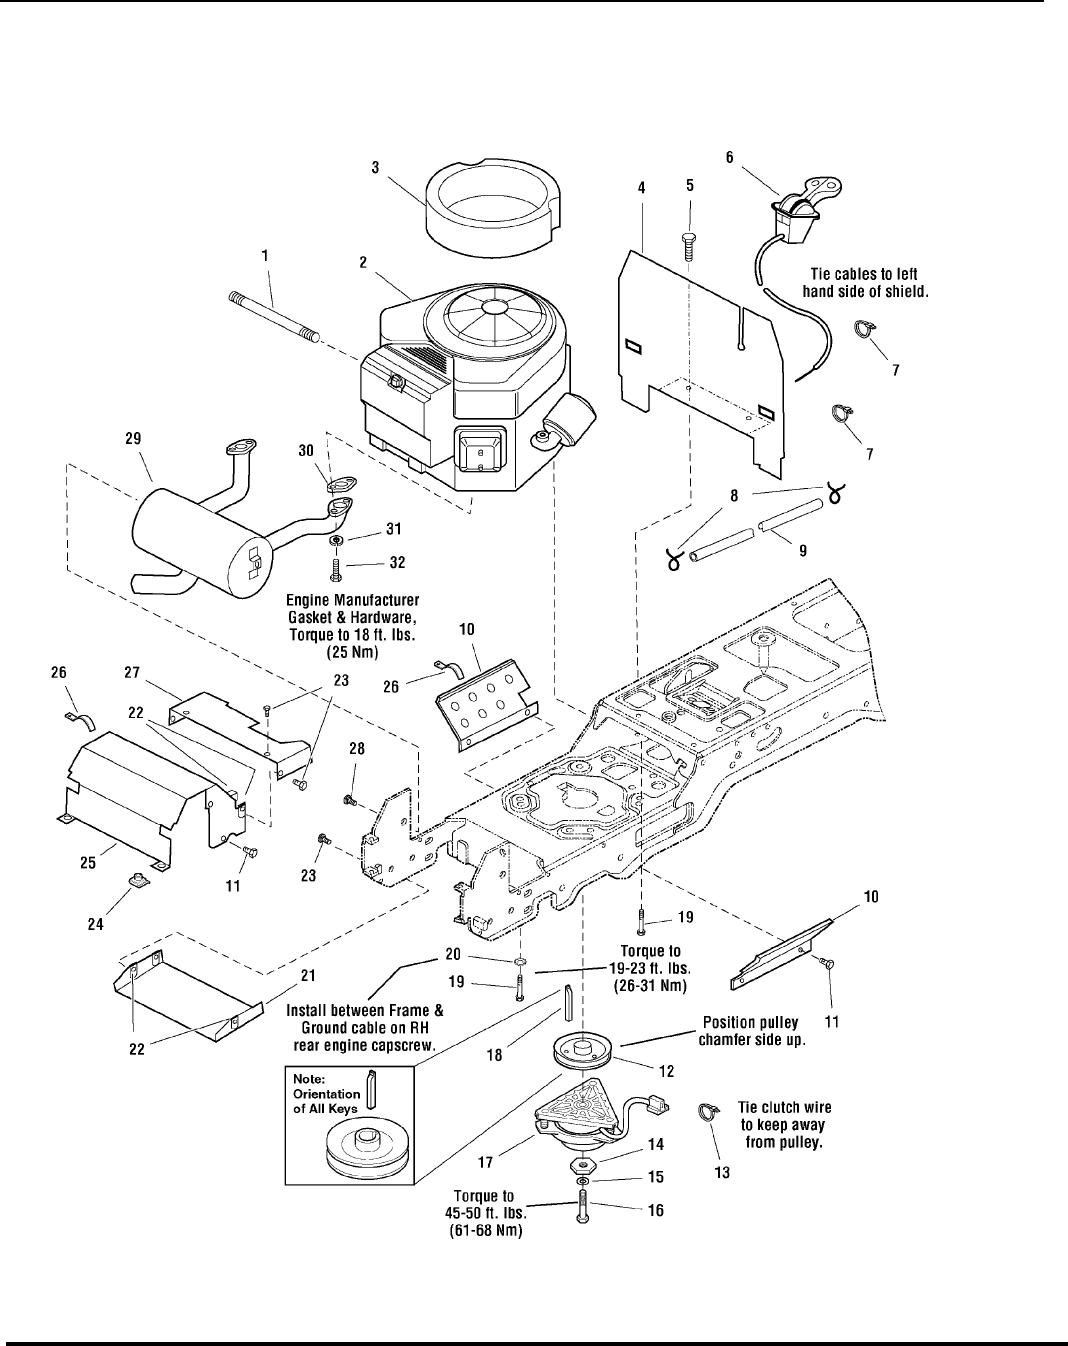 Snapper Yt1644 Yt1844 Yt1850 Yt2050 Users Manual PartsManual